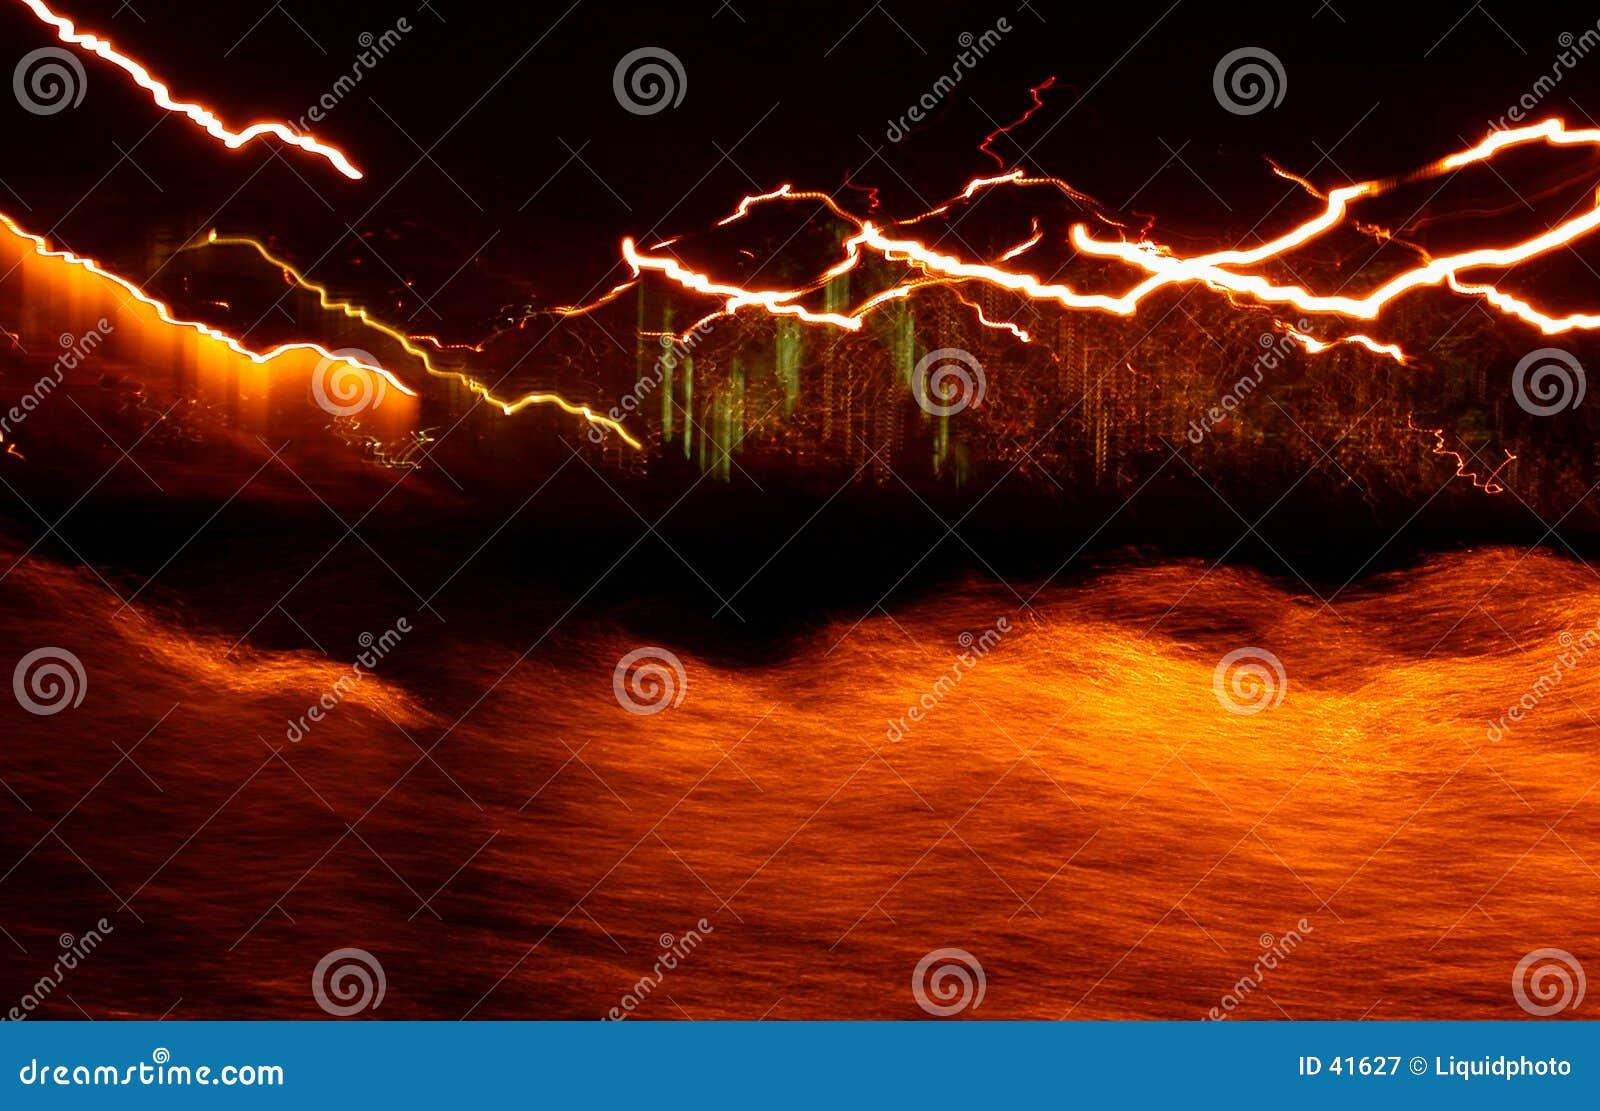 Hawaii light waves